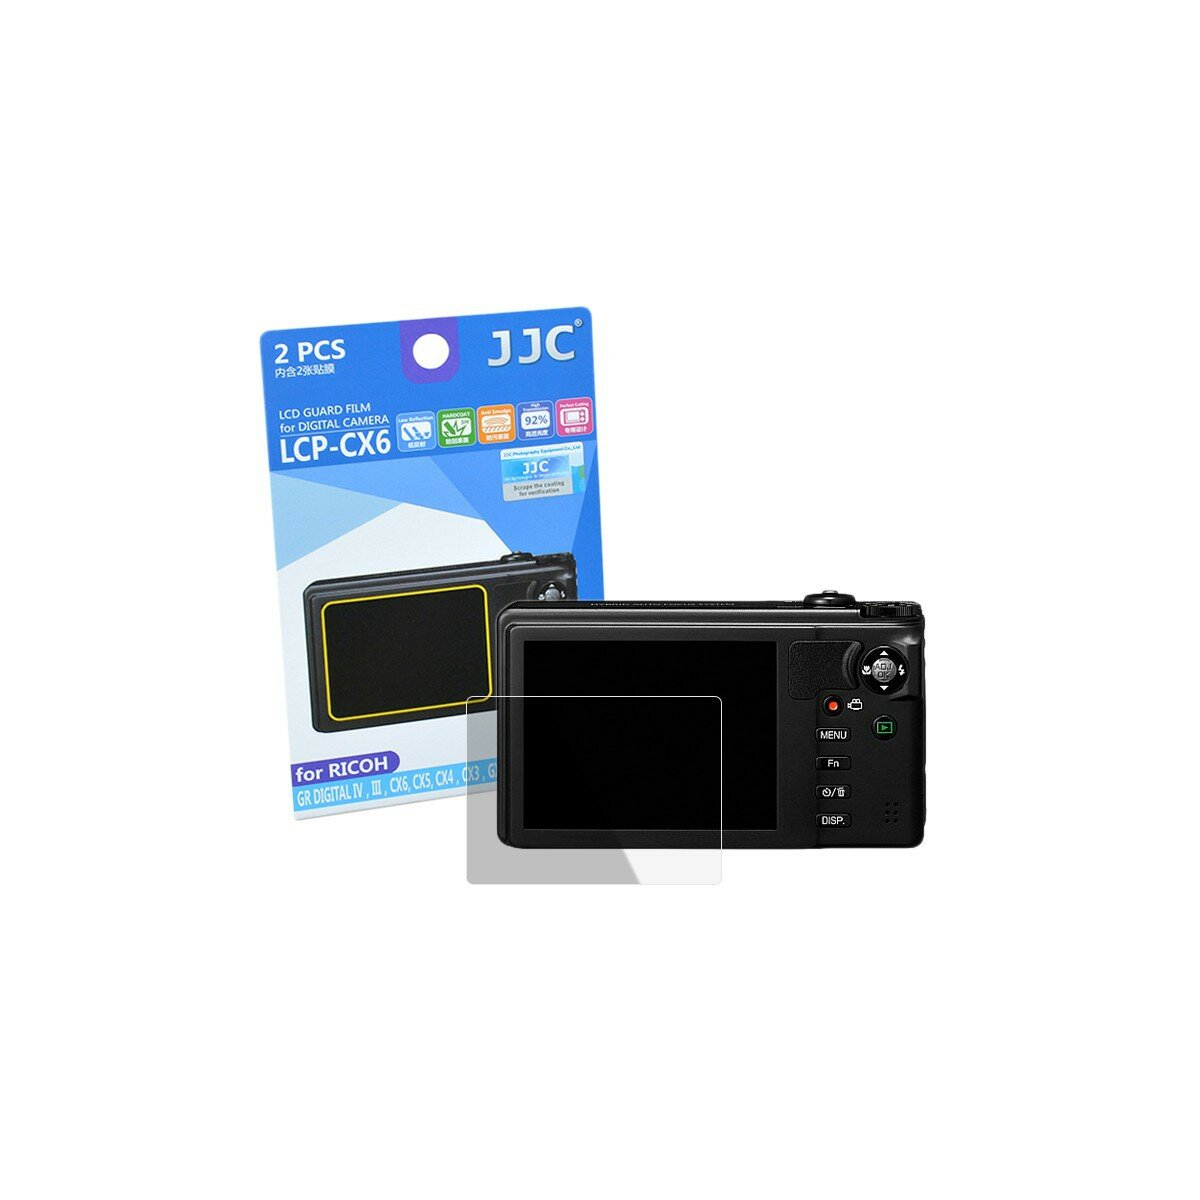 JJC Displayschutzfolie Screen Protector Kratzschutz passgenau fuer Ricoh CX6 - LCP-CX6